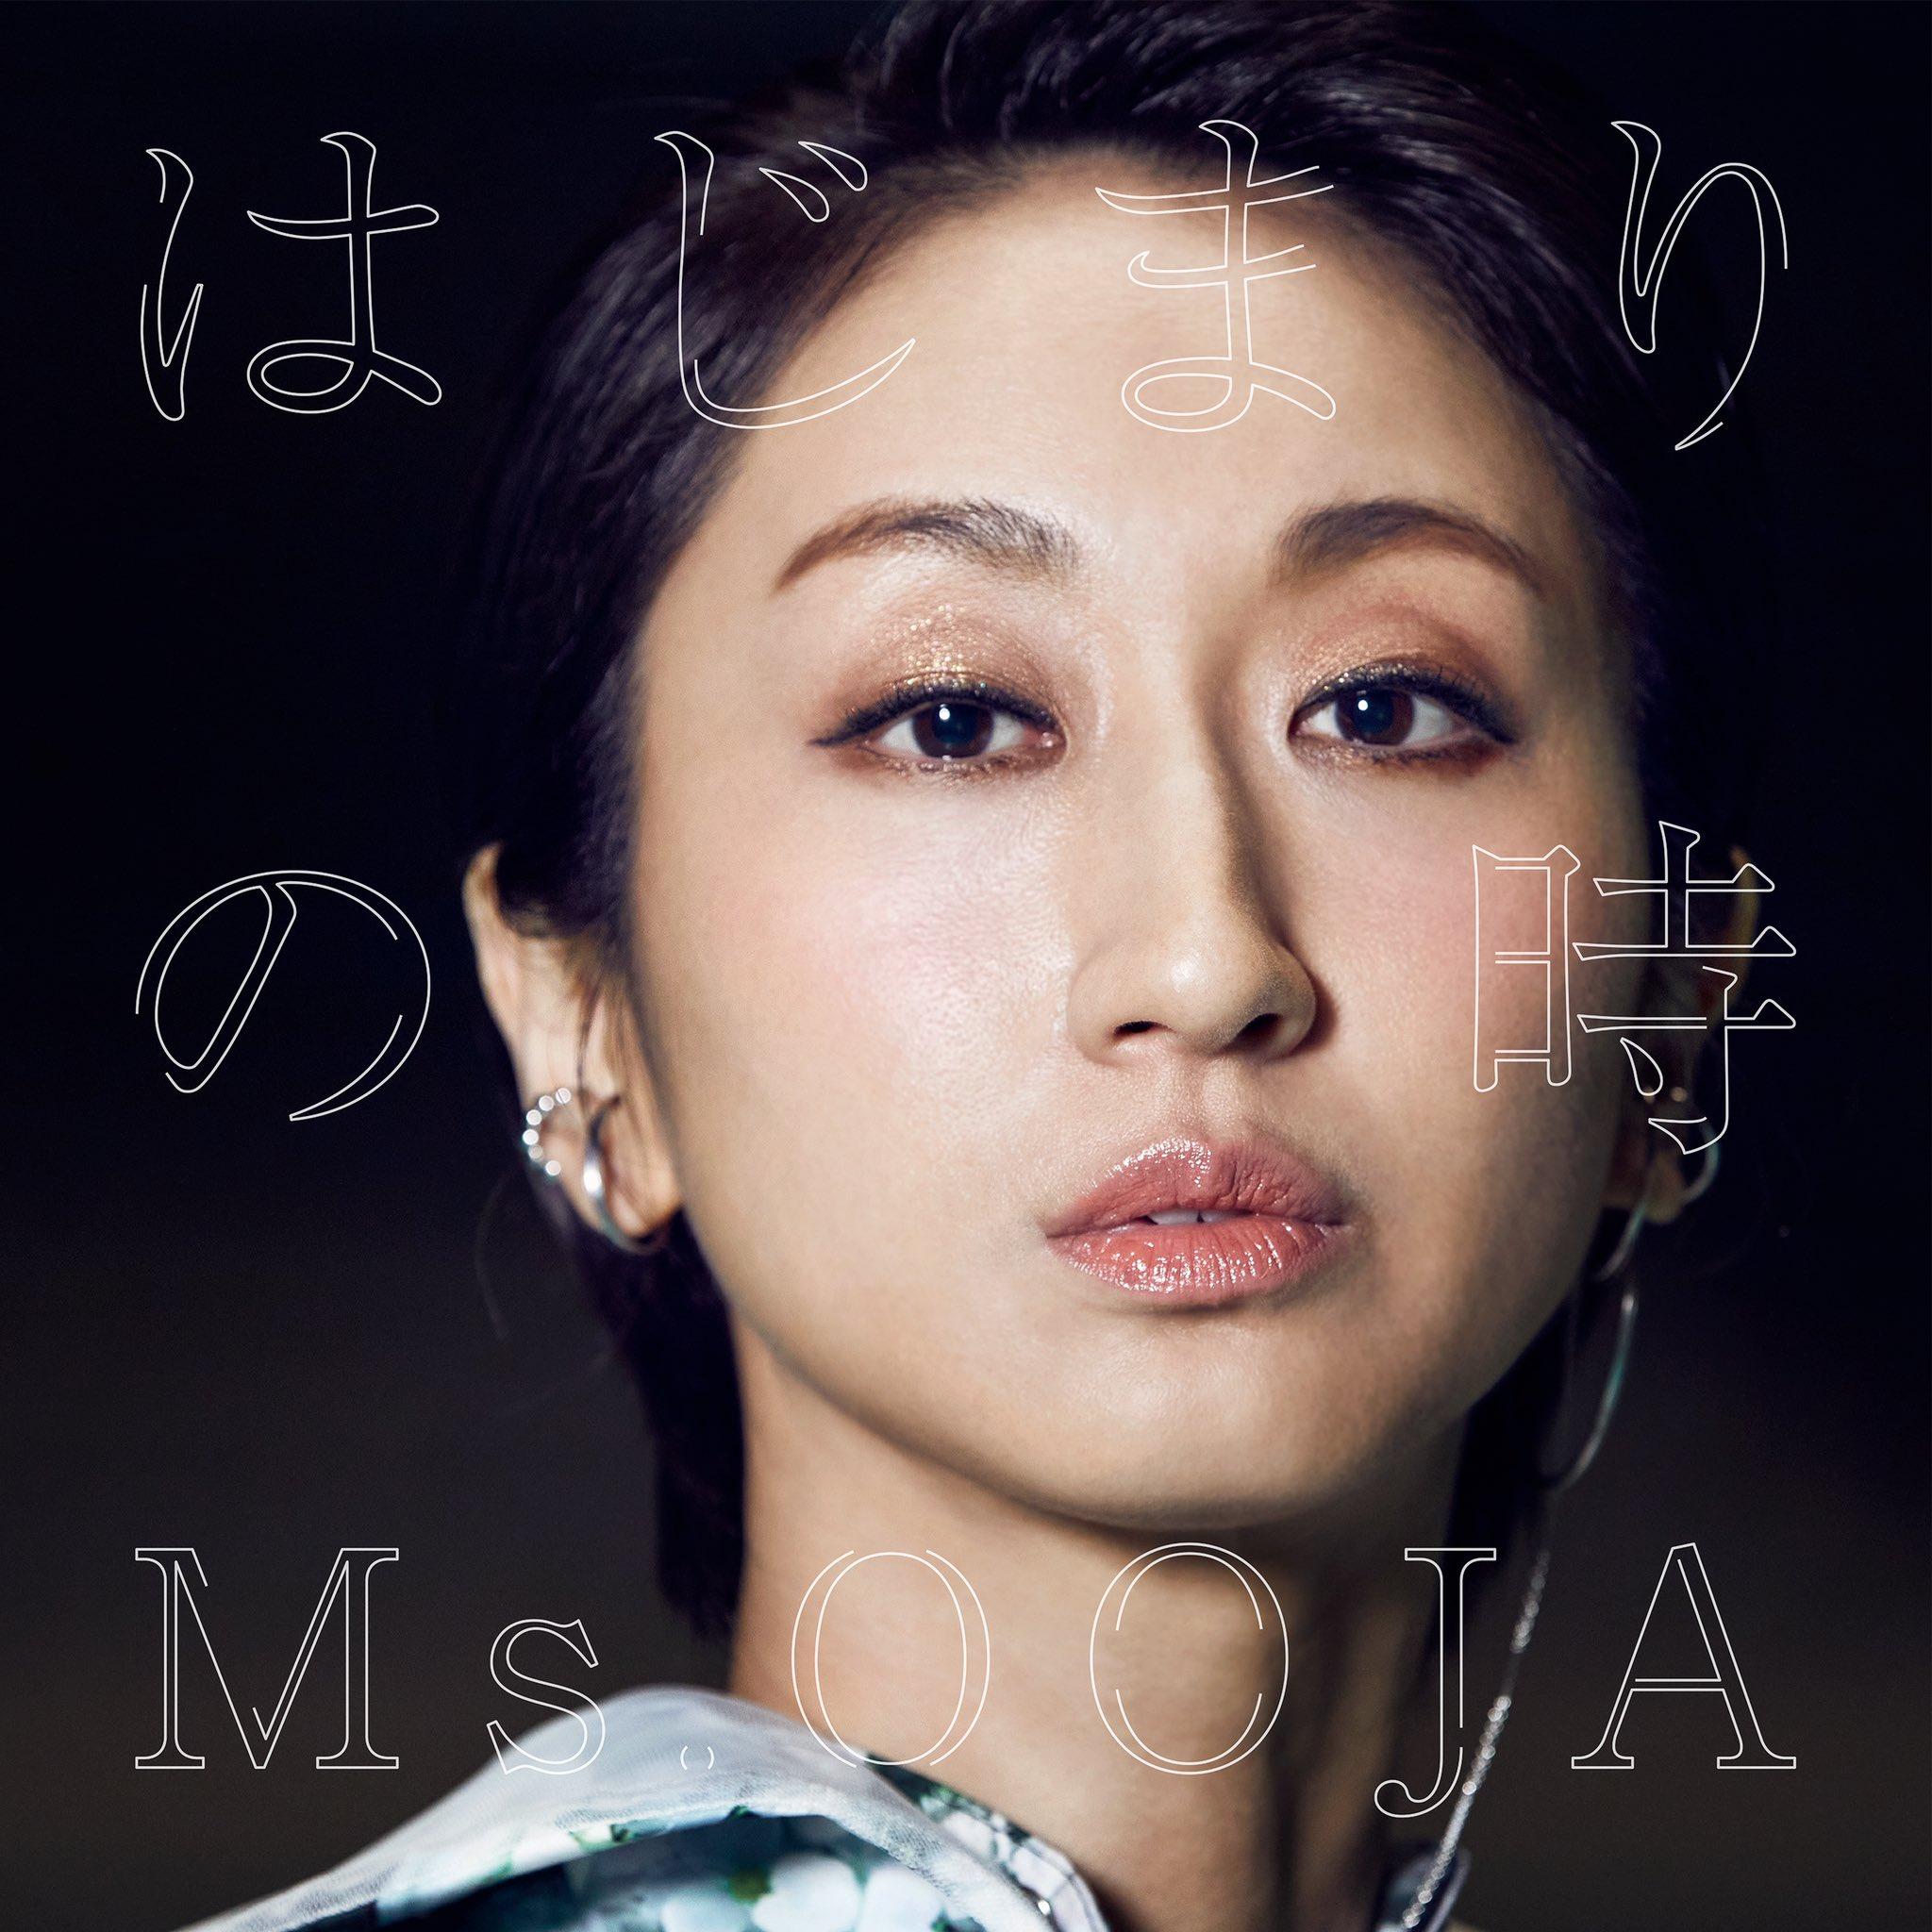 Ms.Ooja - はじまりの時 [2021.02.16+MP3+RAR]